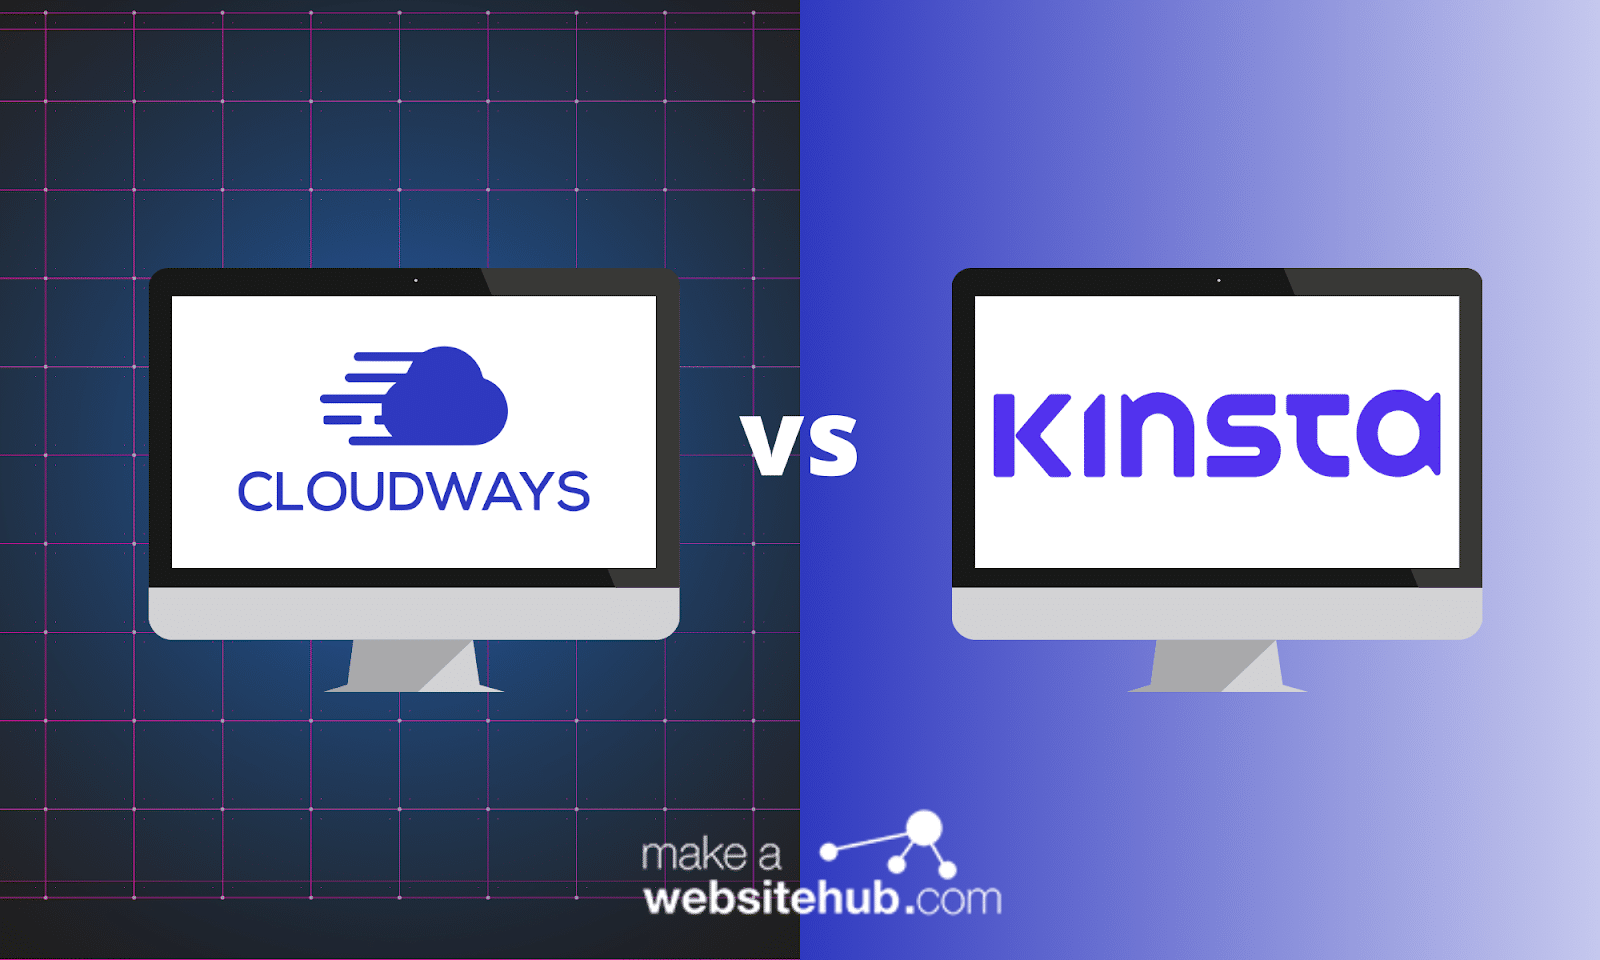 cloudways vs kinsta